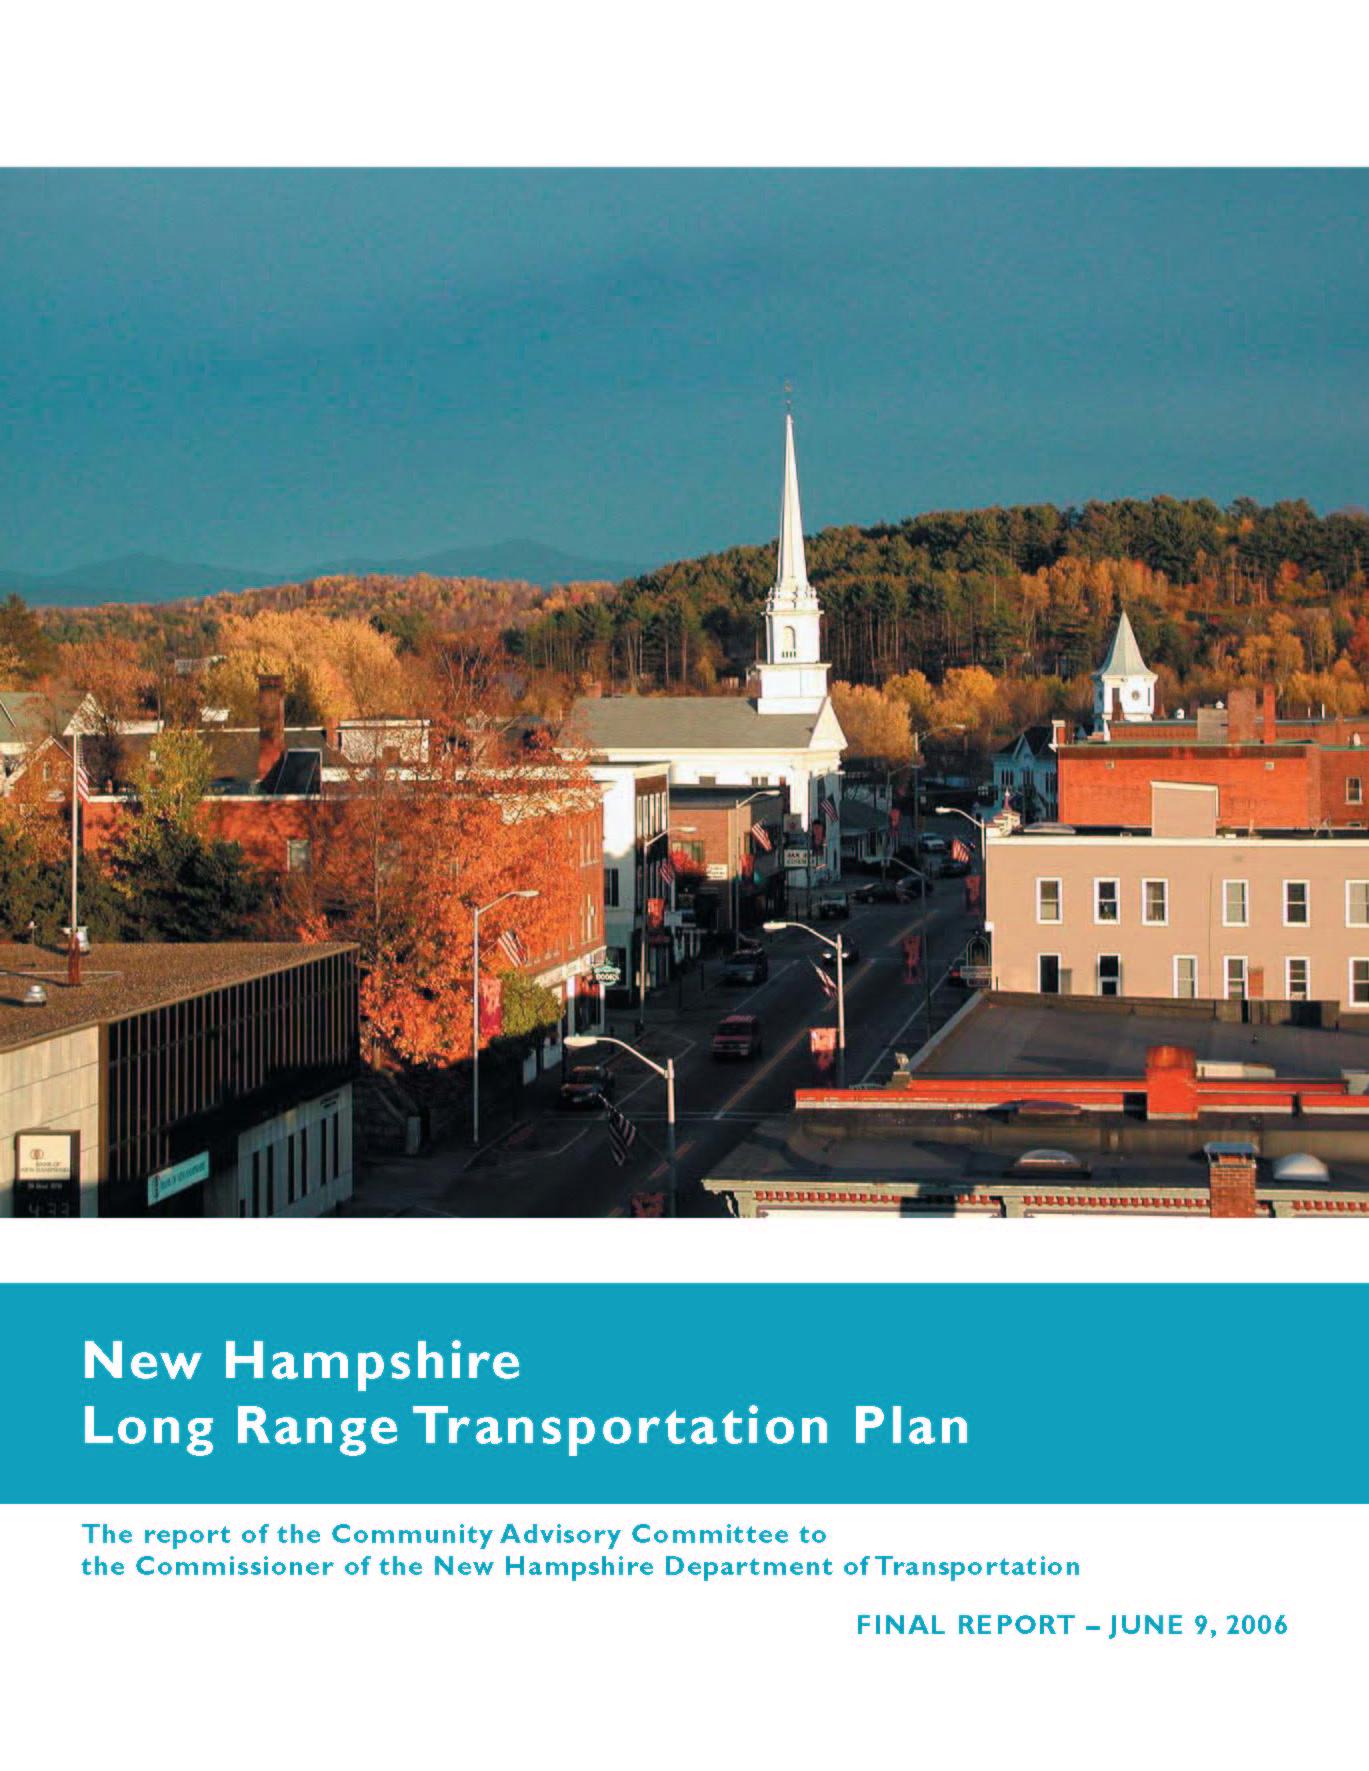 New Hampshire Long Range Transportation Plan